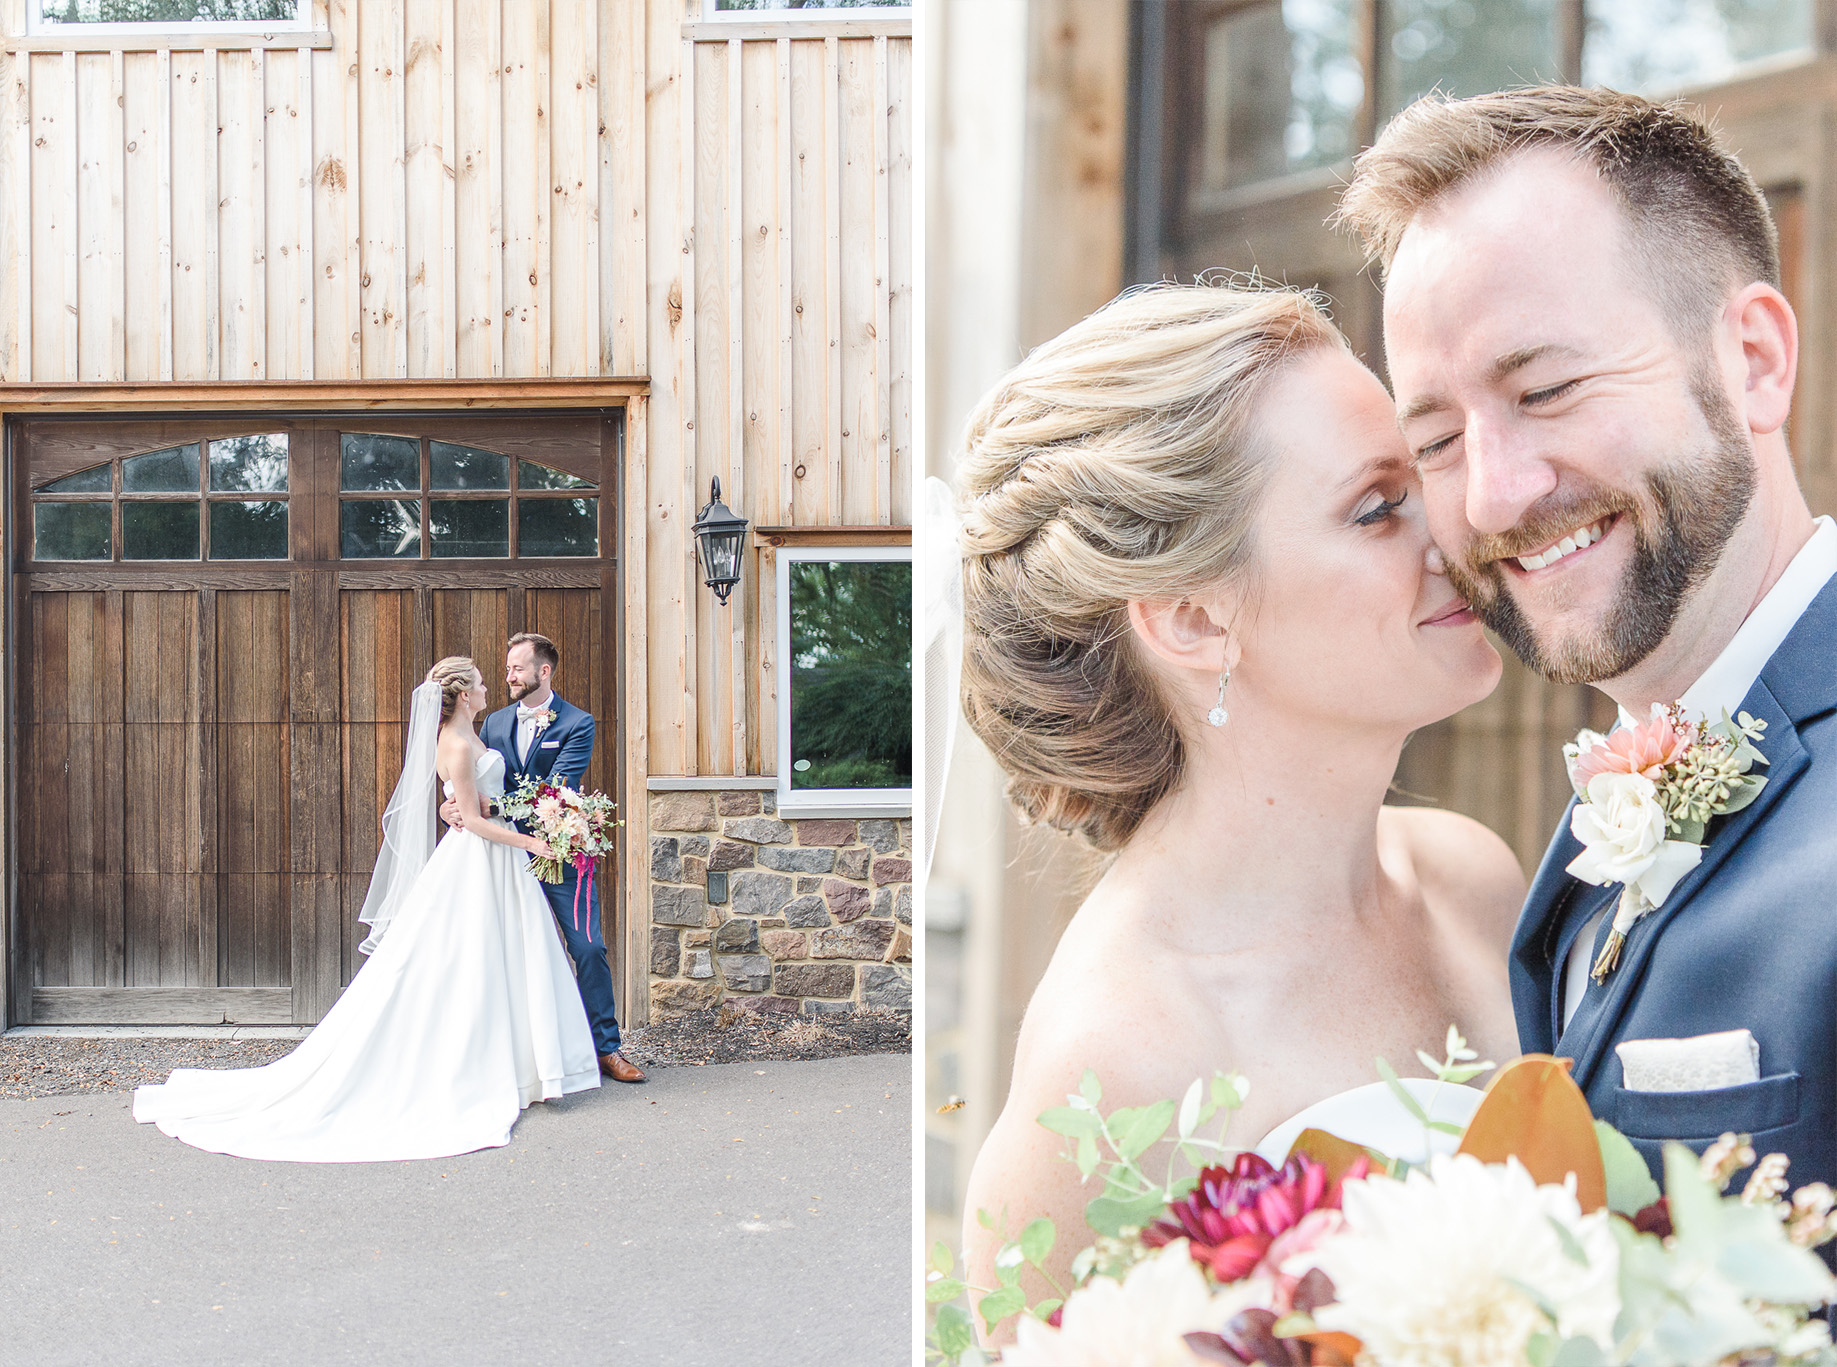 Kaitlin_and_Matt_Wedding_Double_FOR_BLOG_1.jpg